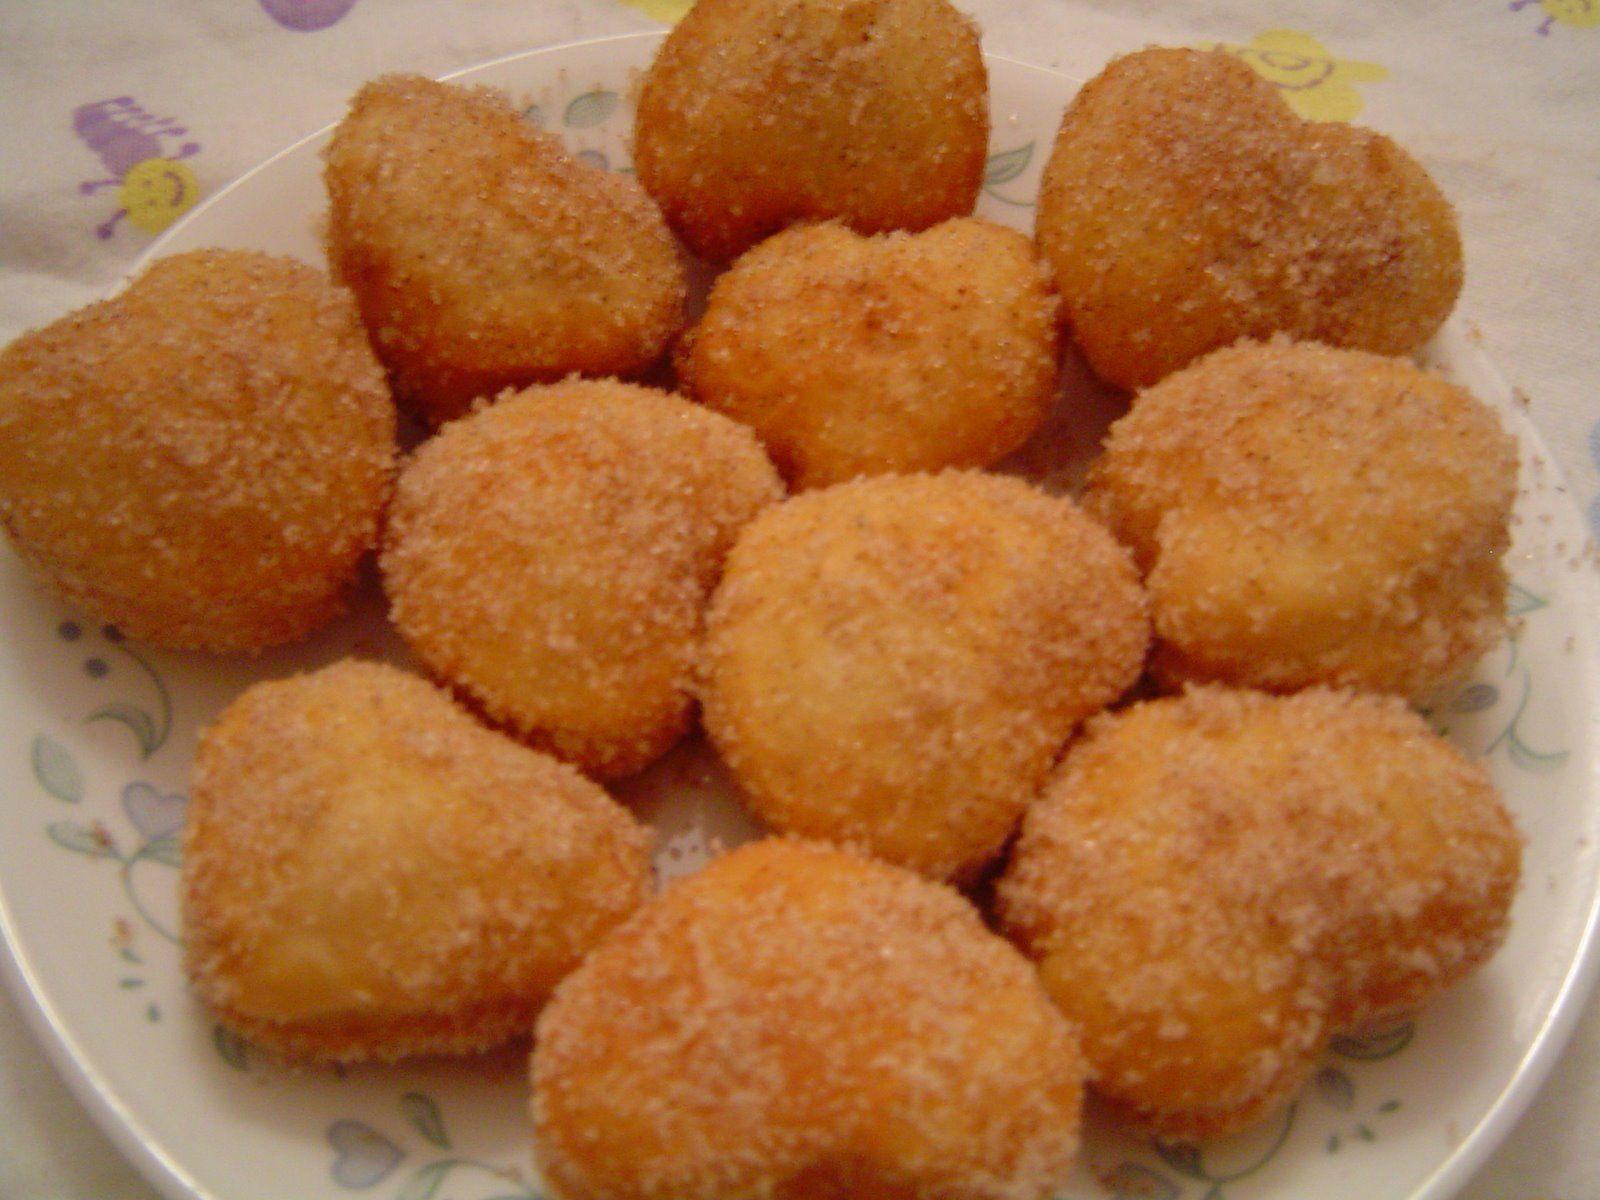 Norwegian Potato Doughnuts Recipes For Scandinavian Dessert International Recipes International Desserts Recipes Scandinavian Desserts Scandinavian Food